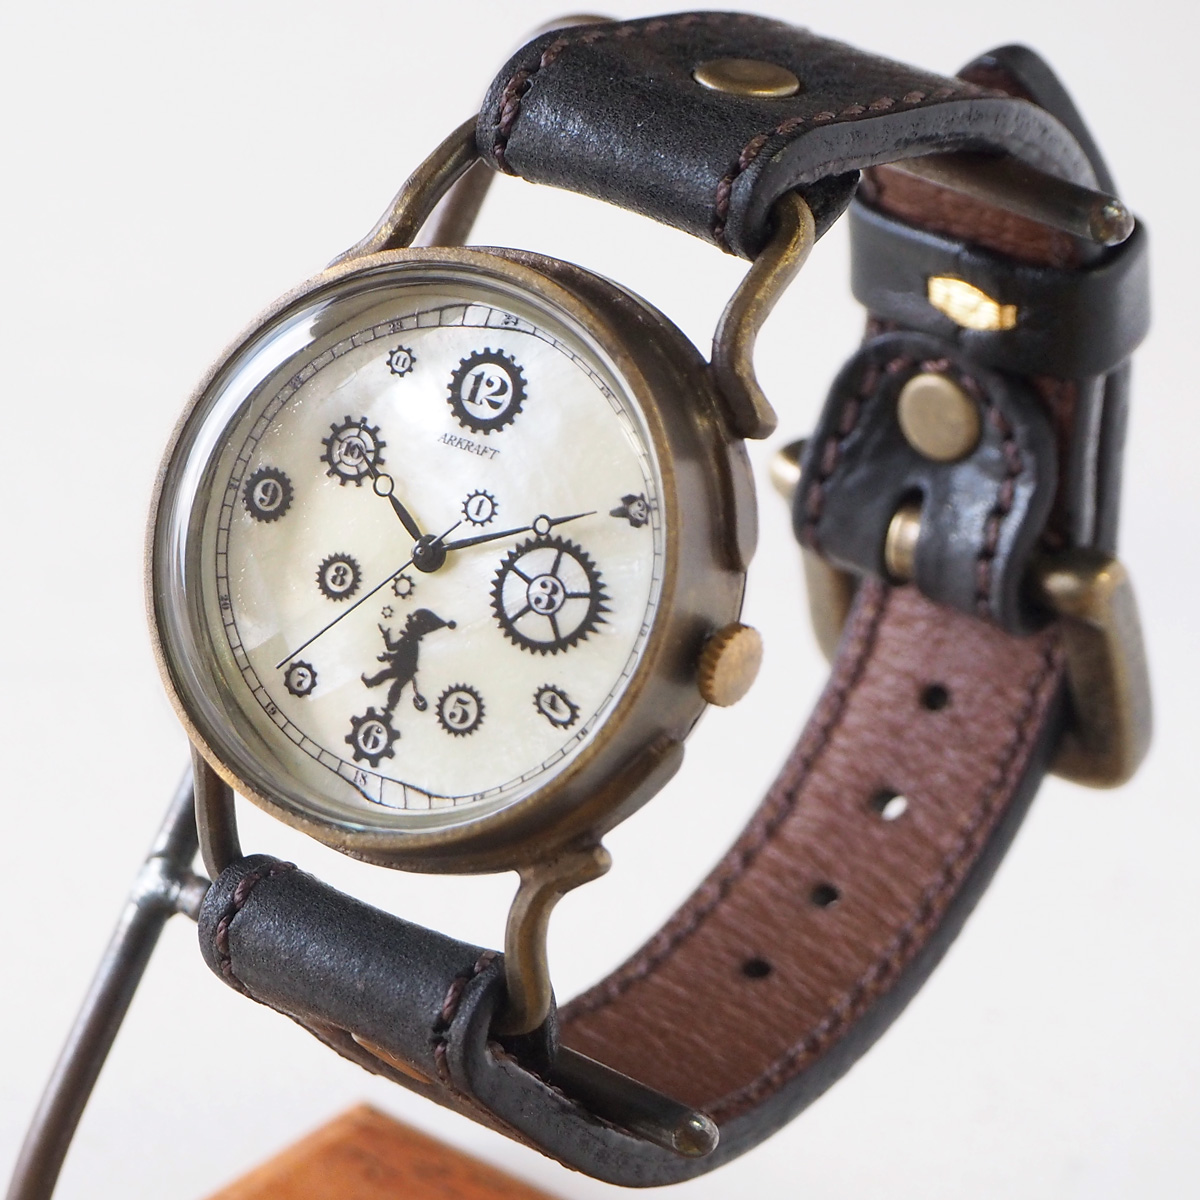 "ARKRAFT(アークラフト) 時計作家・新木秀和 手作り腕時計 ""Pivo Large"" ホワイトシェル文字盤 プレミアムストラップ [AR-C-014-WH]"